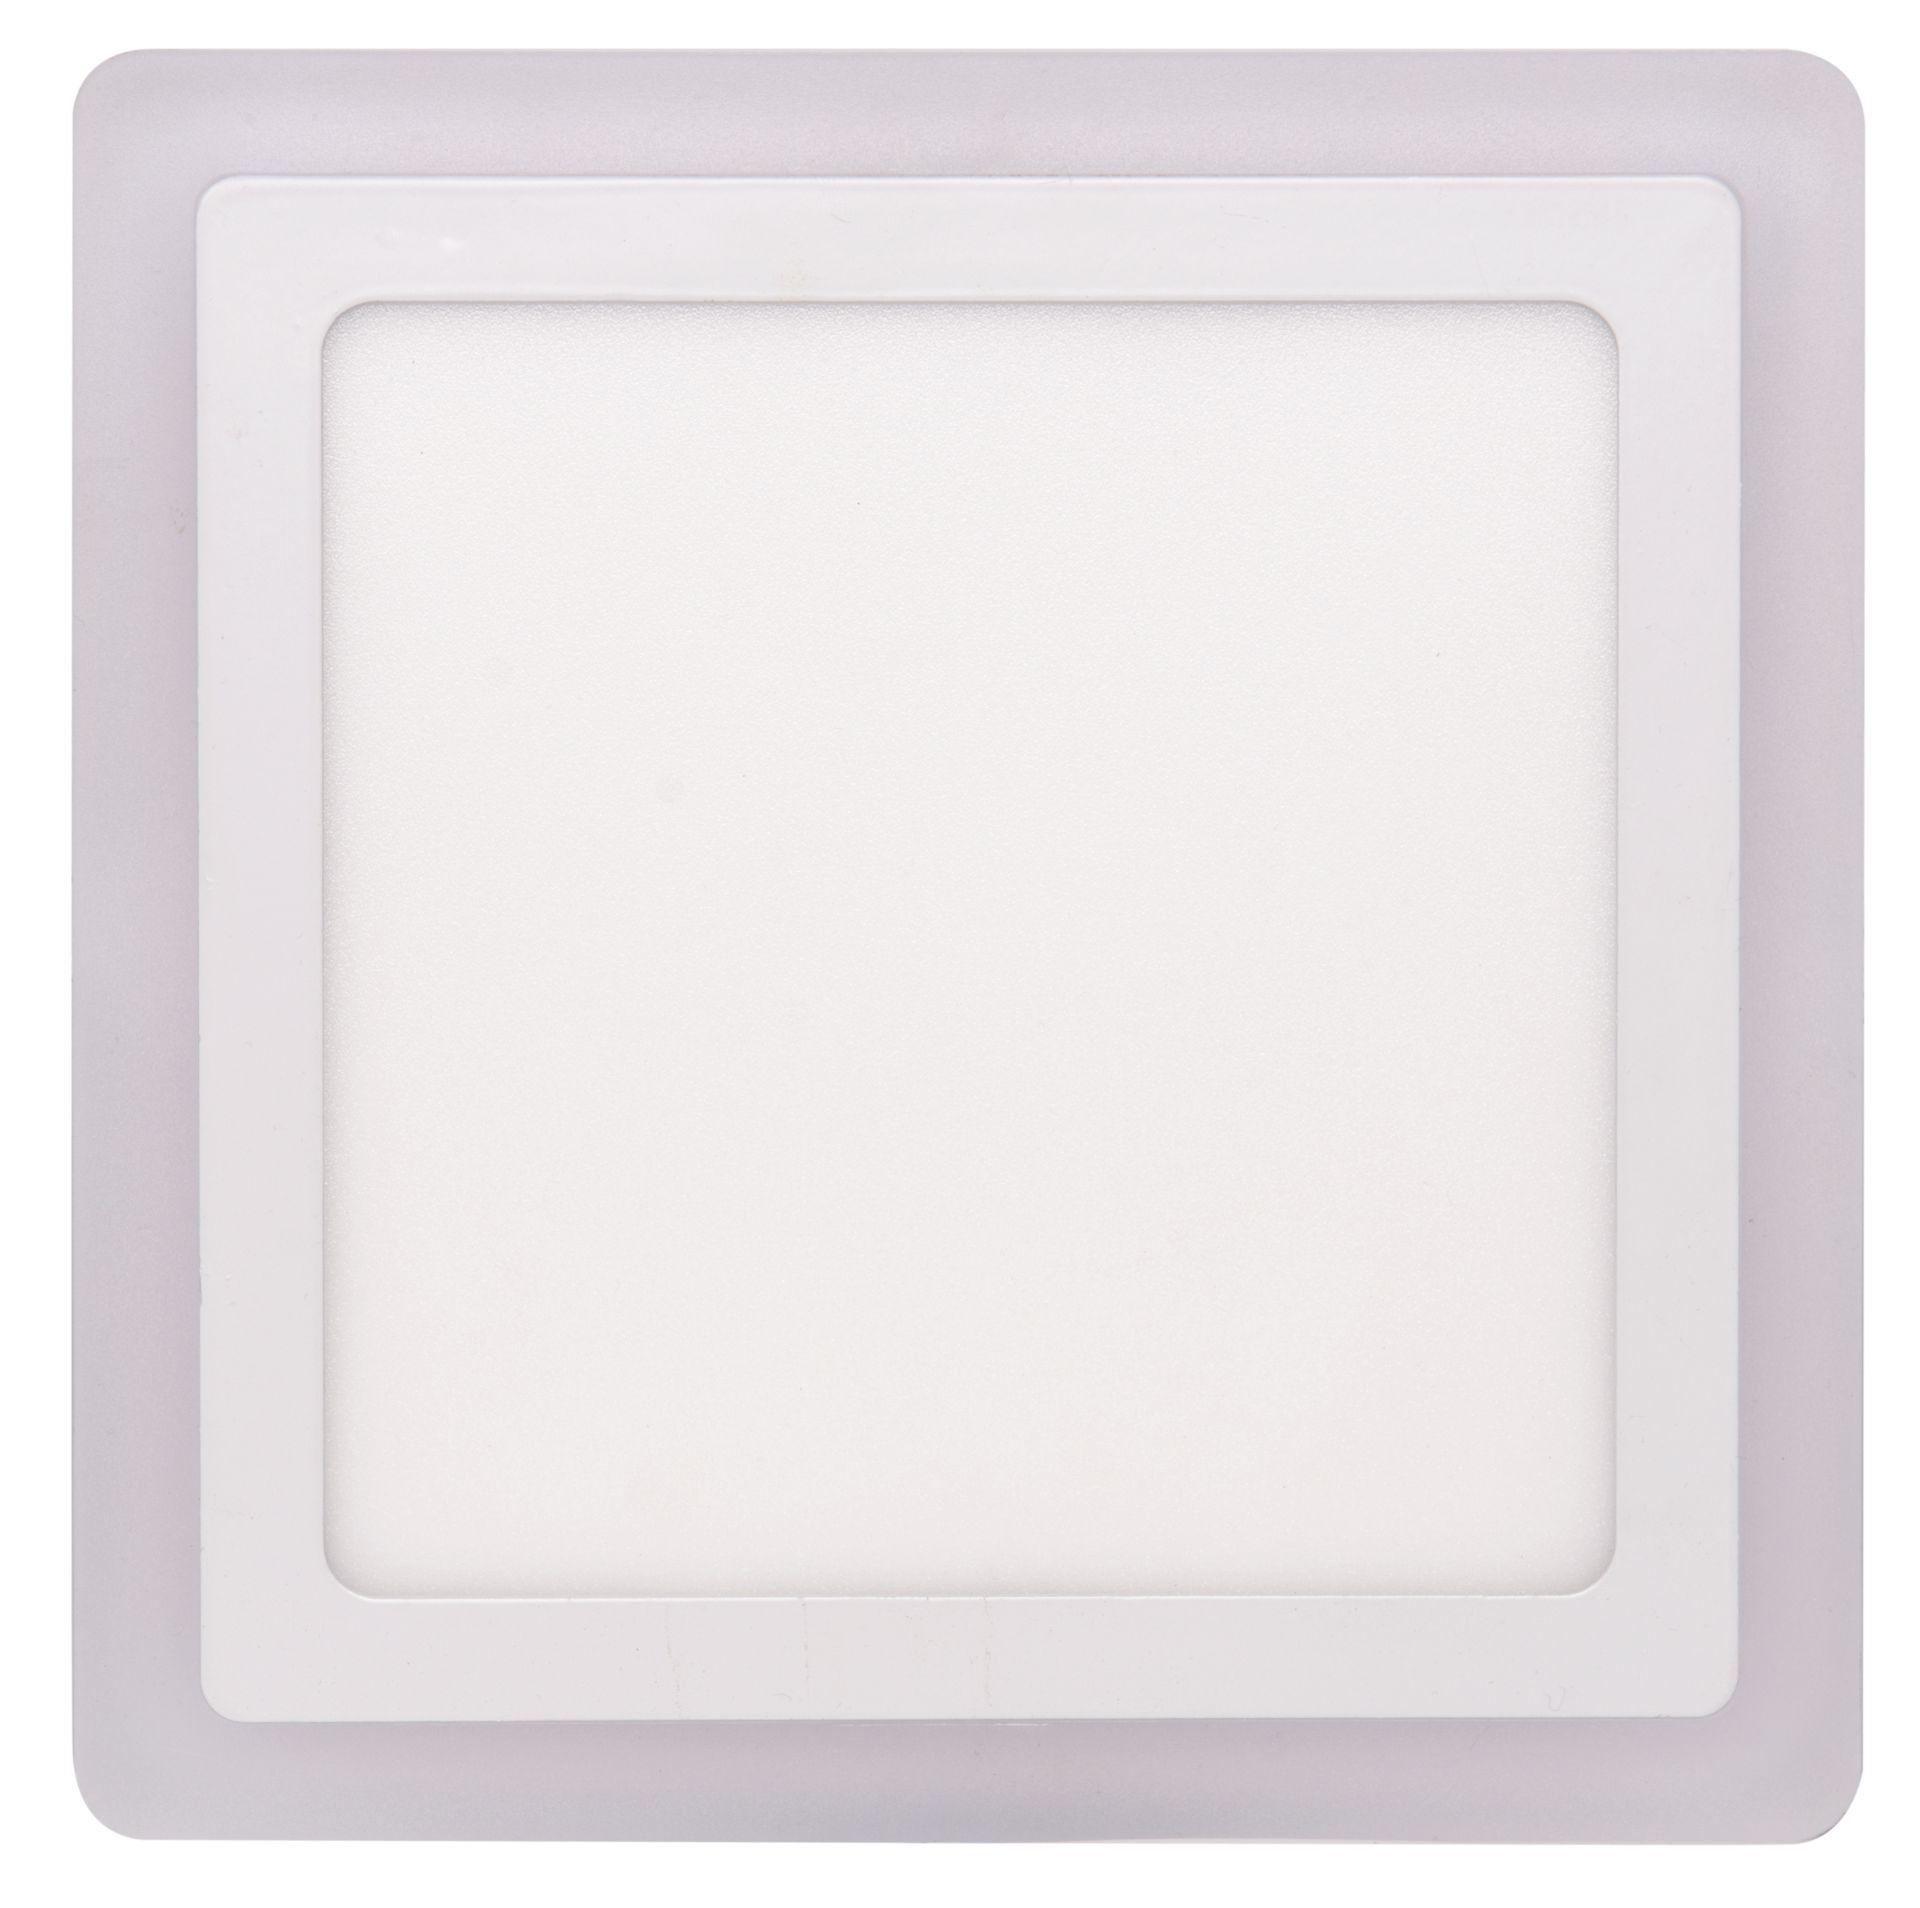 Ecolite Biely vstavaný LED panel hranatý 245 x 245mm 18W+6W podsvietený LED-DUO-S18W